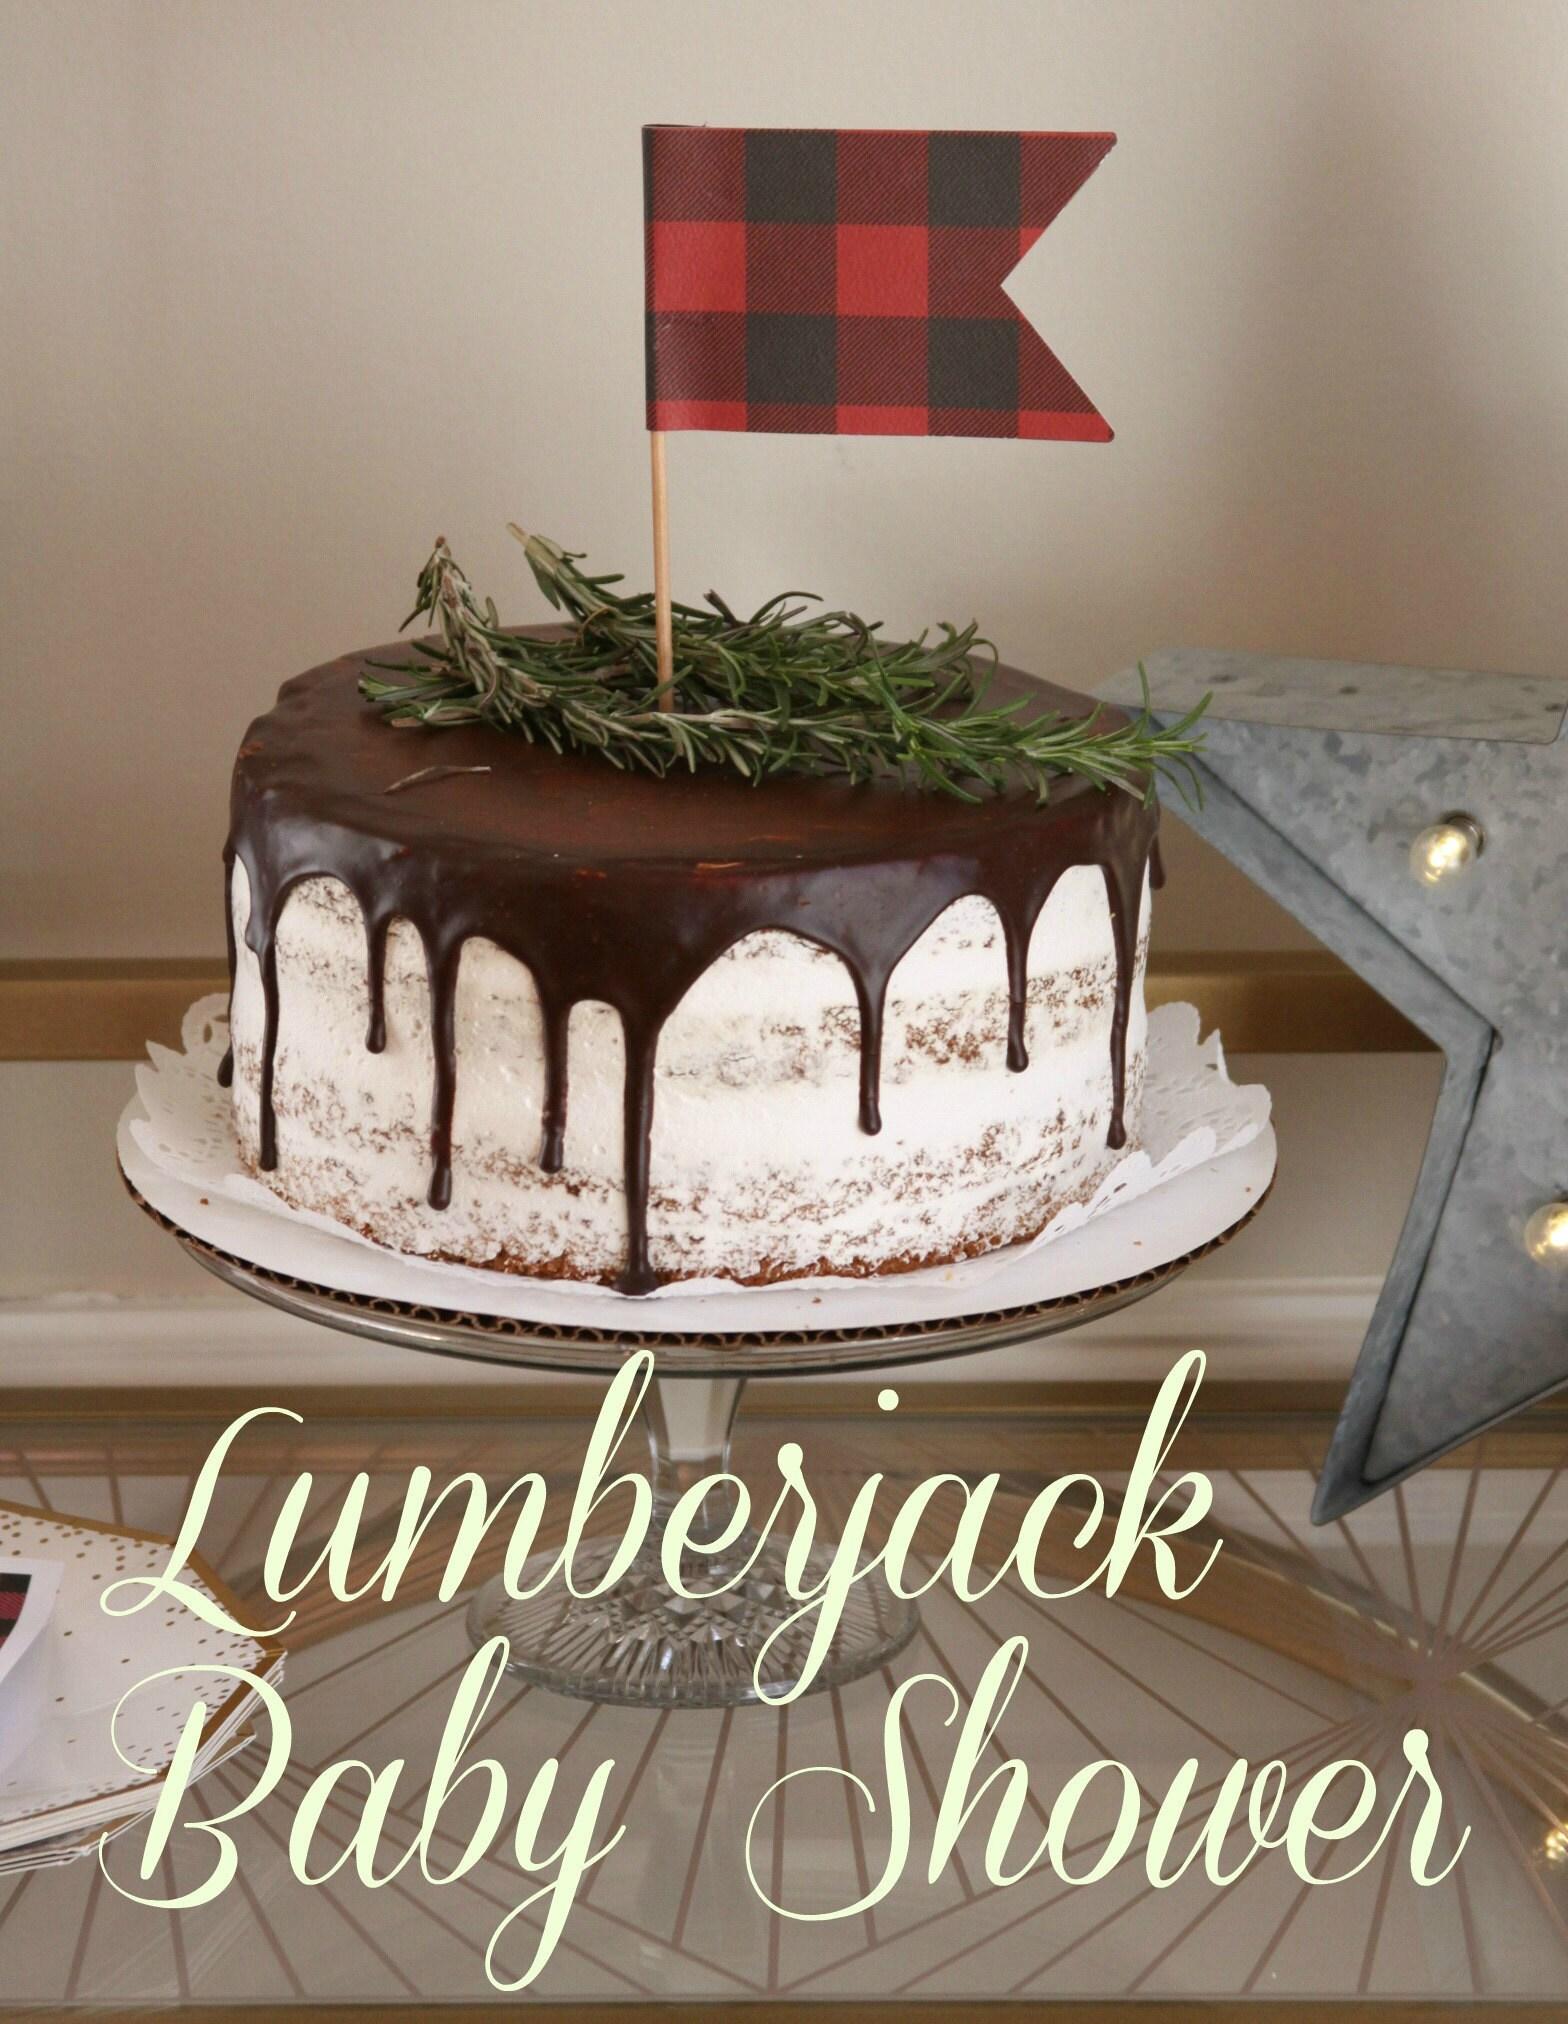 Lumberjack baby shower cake!